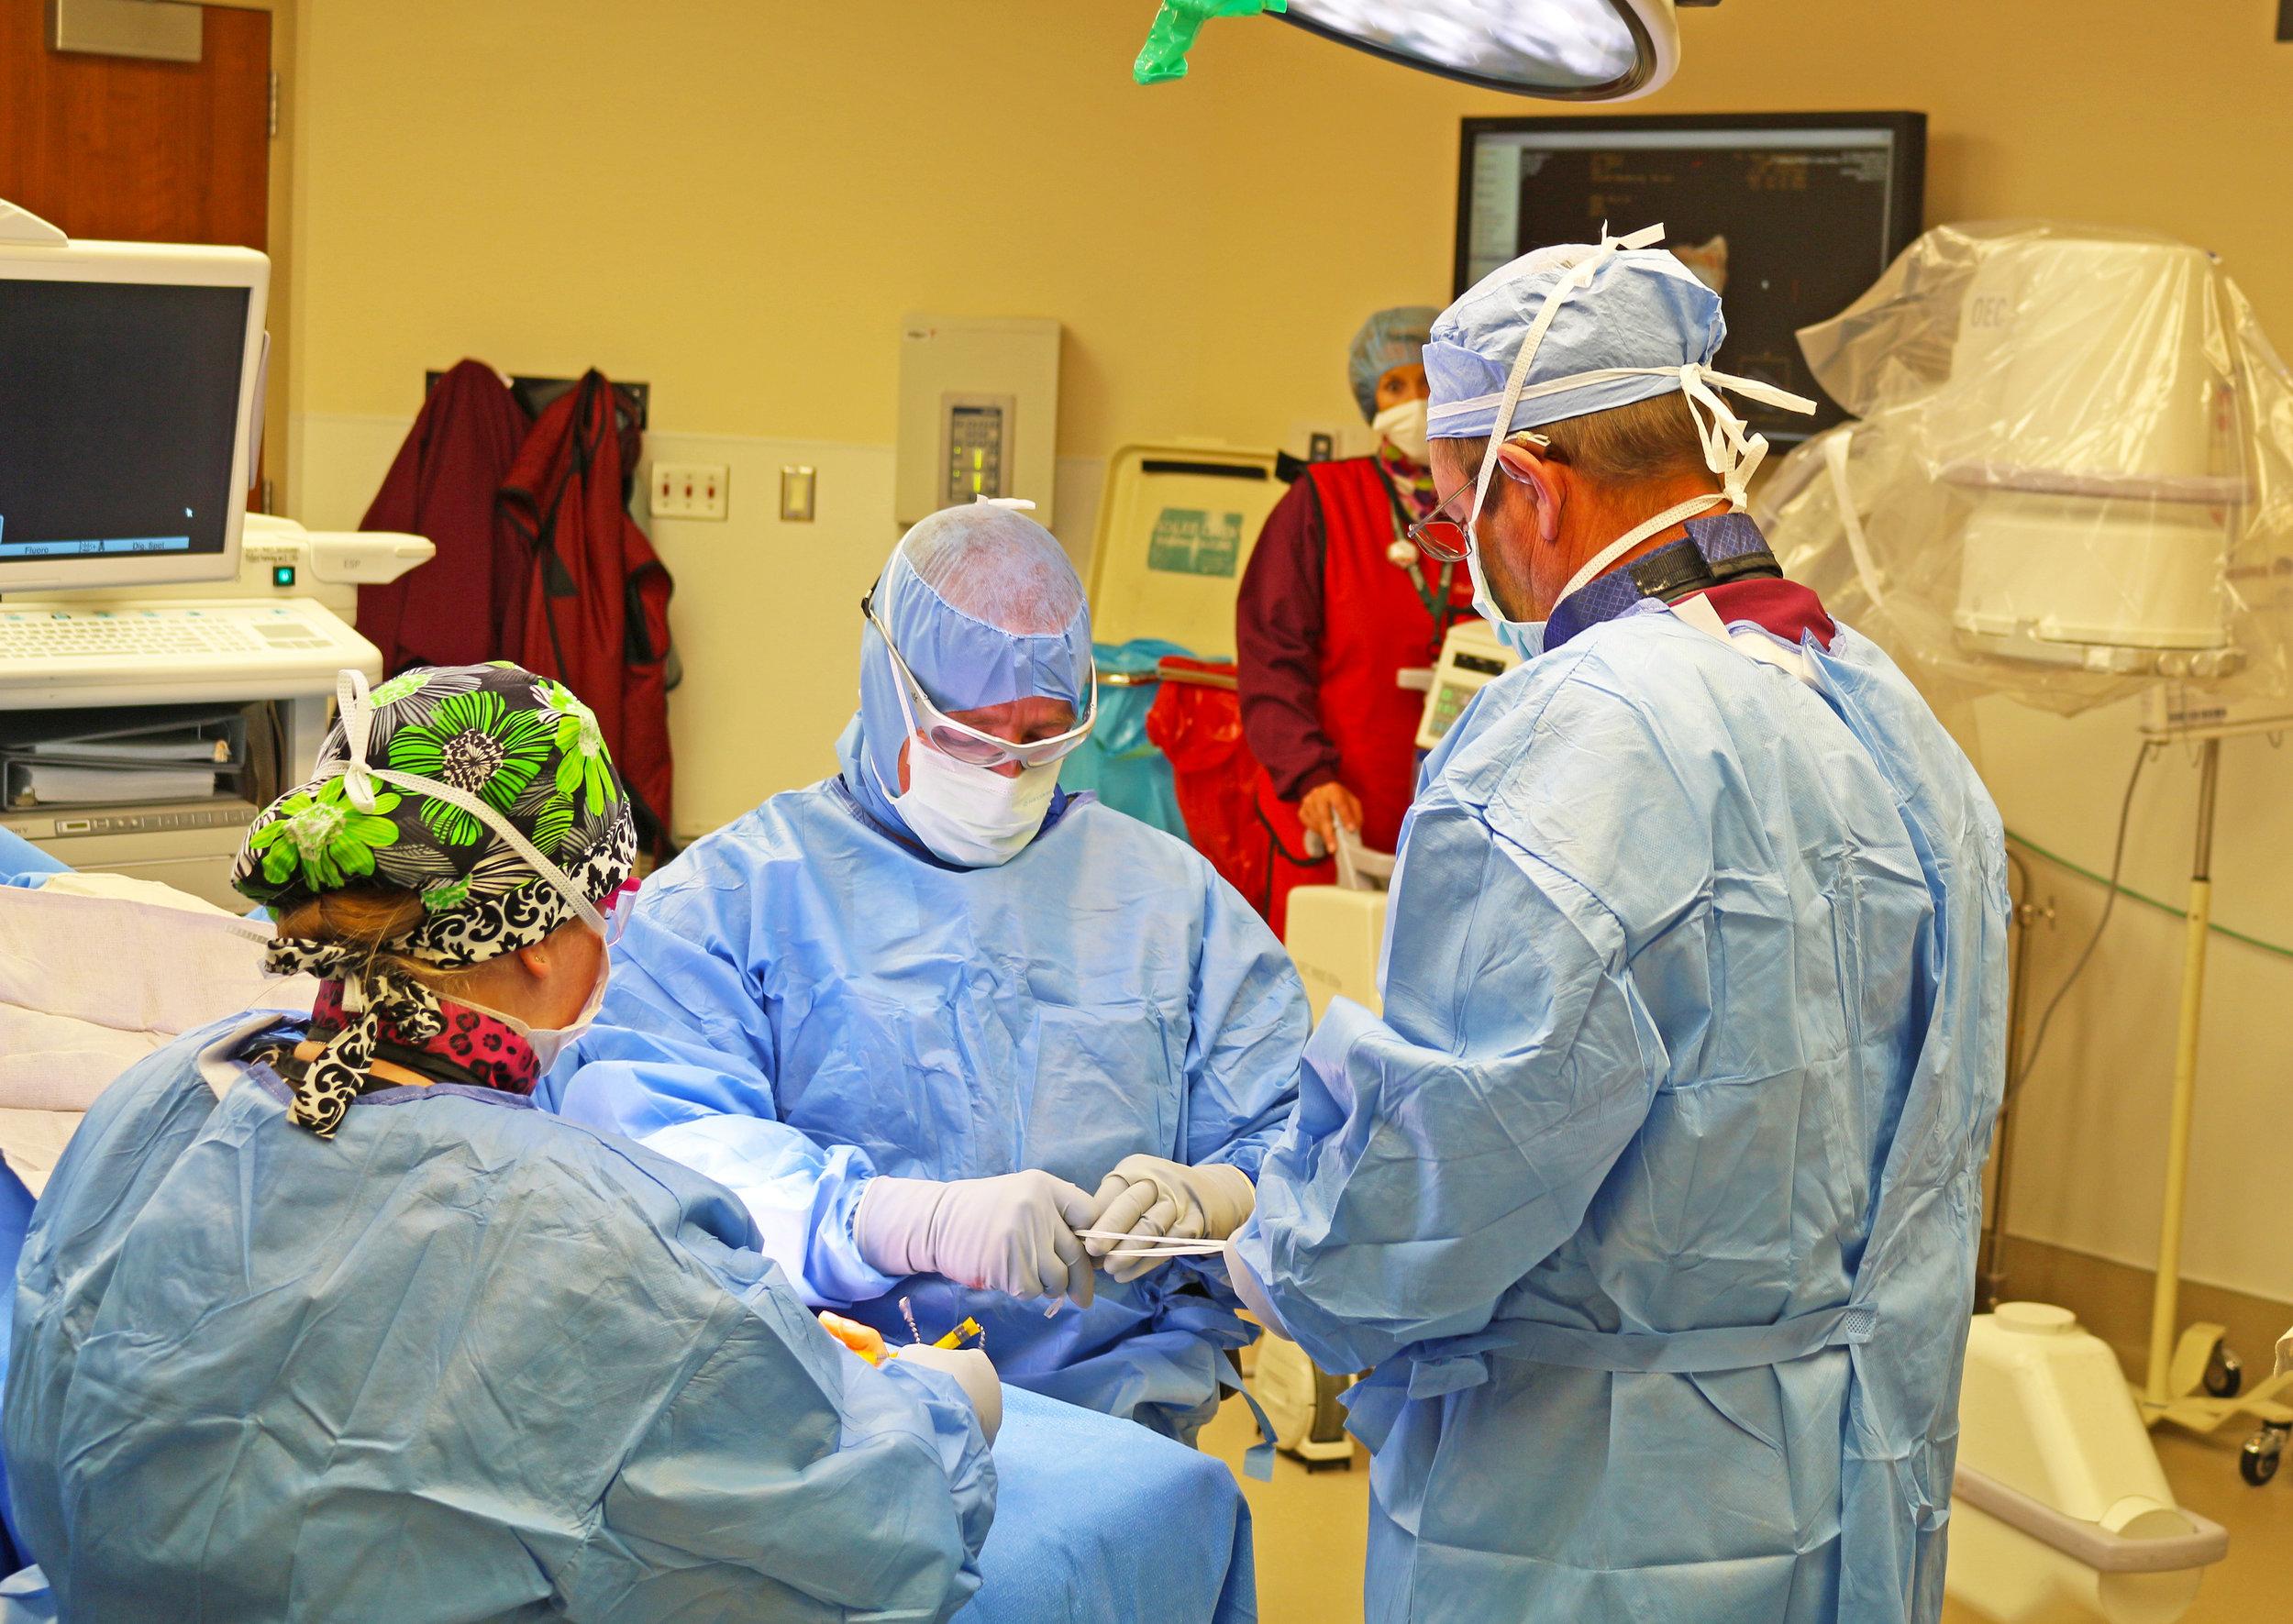 Associates prepare for surgery at St. James Healthcare